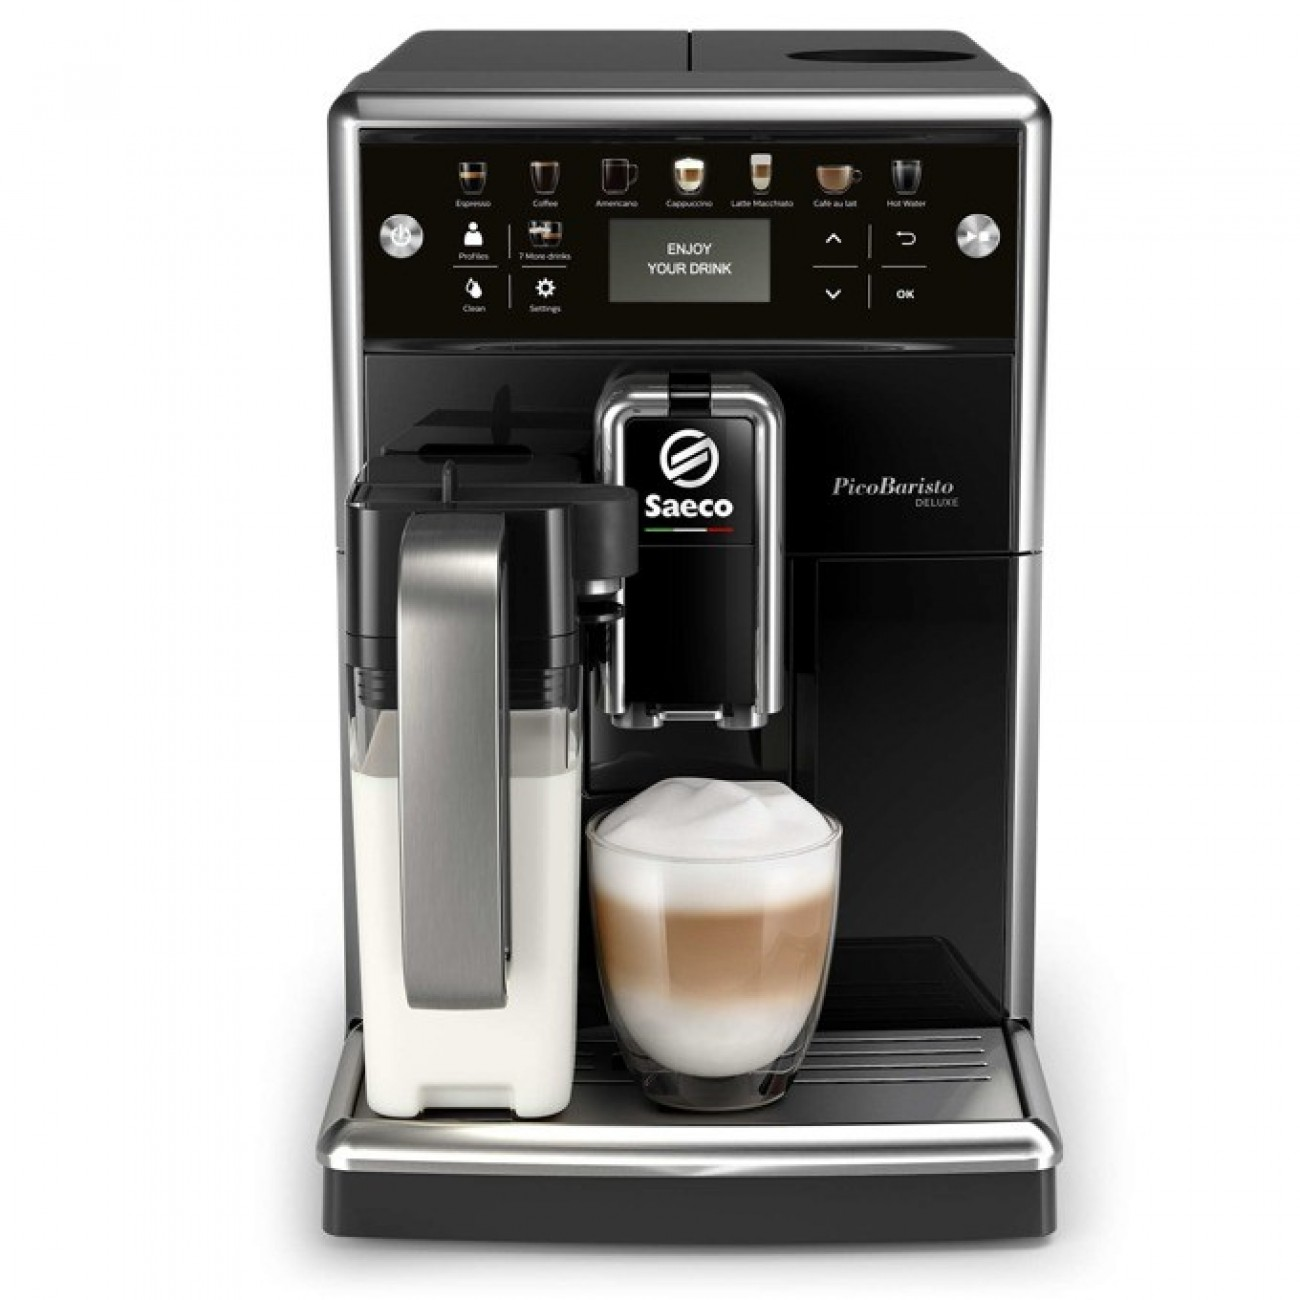 Автоматична еспресо машина Philips Saeco PicoBaristo SM5570/10, 13 напитки, 1,7л резервоар, вградена първокласна кана за мляко, 12-степенна регулируема мелачка, черна в Кафемашини -    Alleop